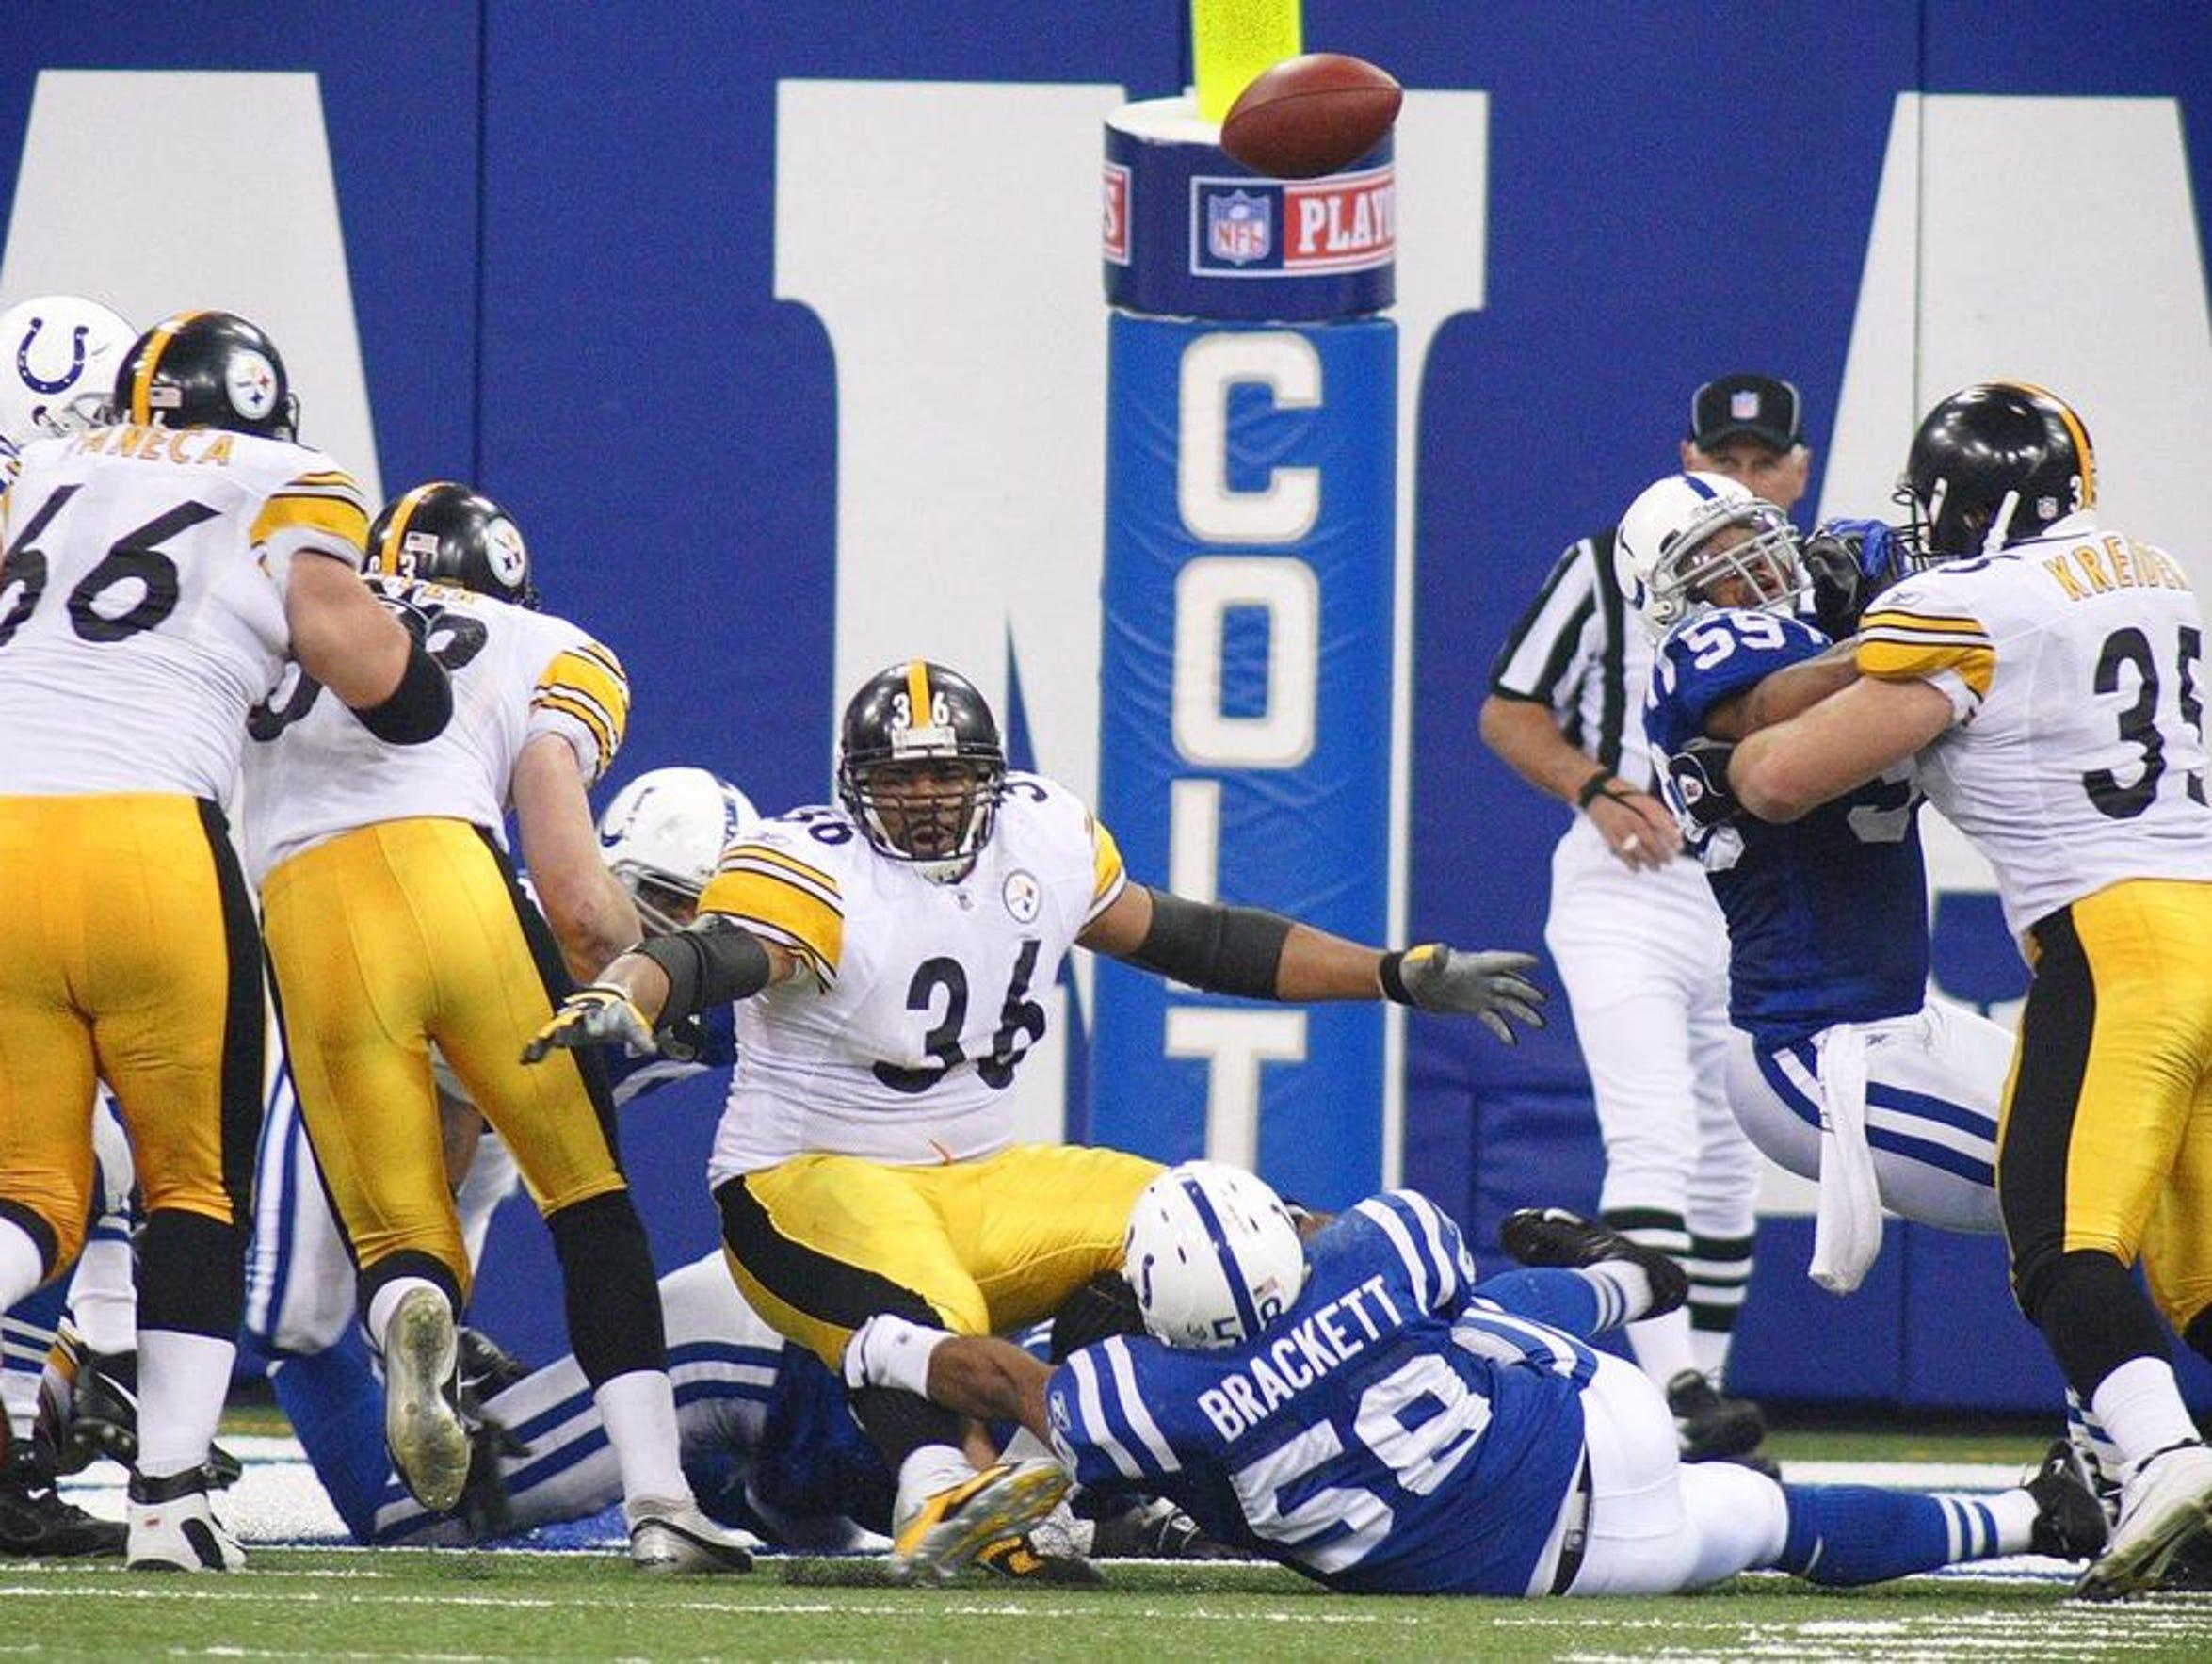 Jerome Bettis, playing his final NFL season, hadn't